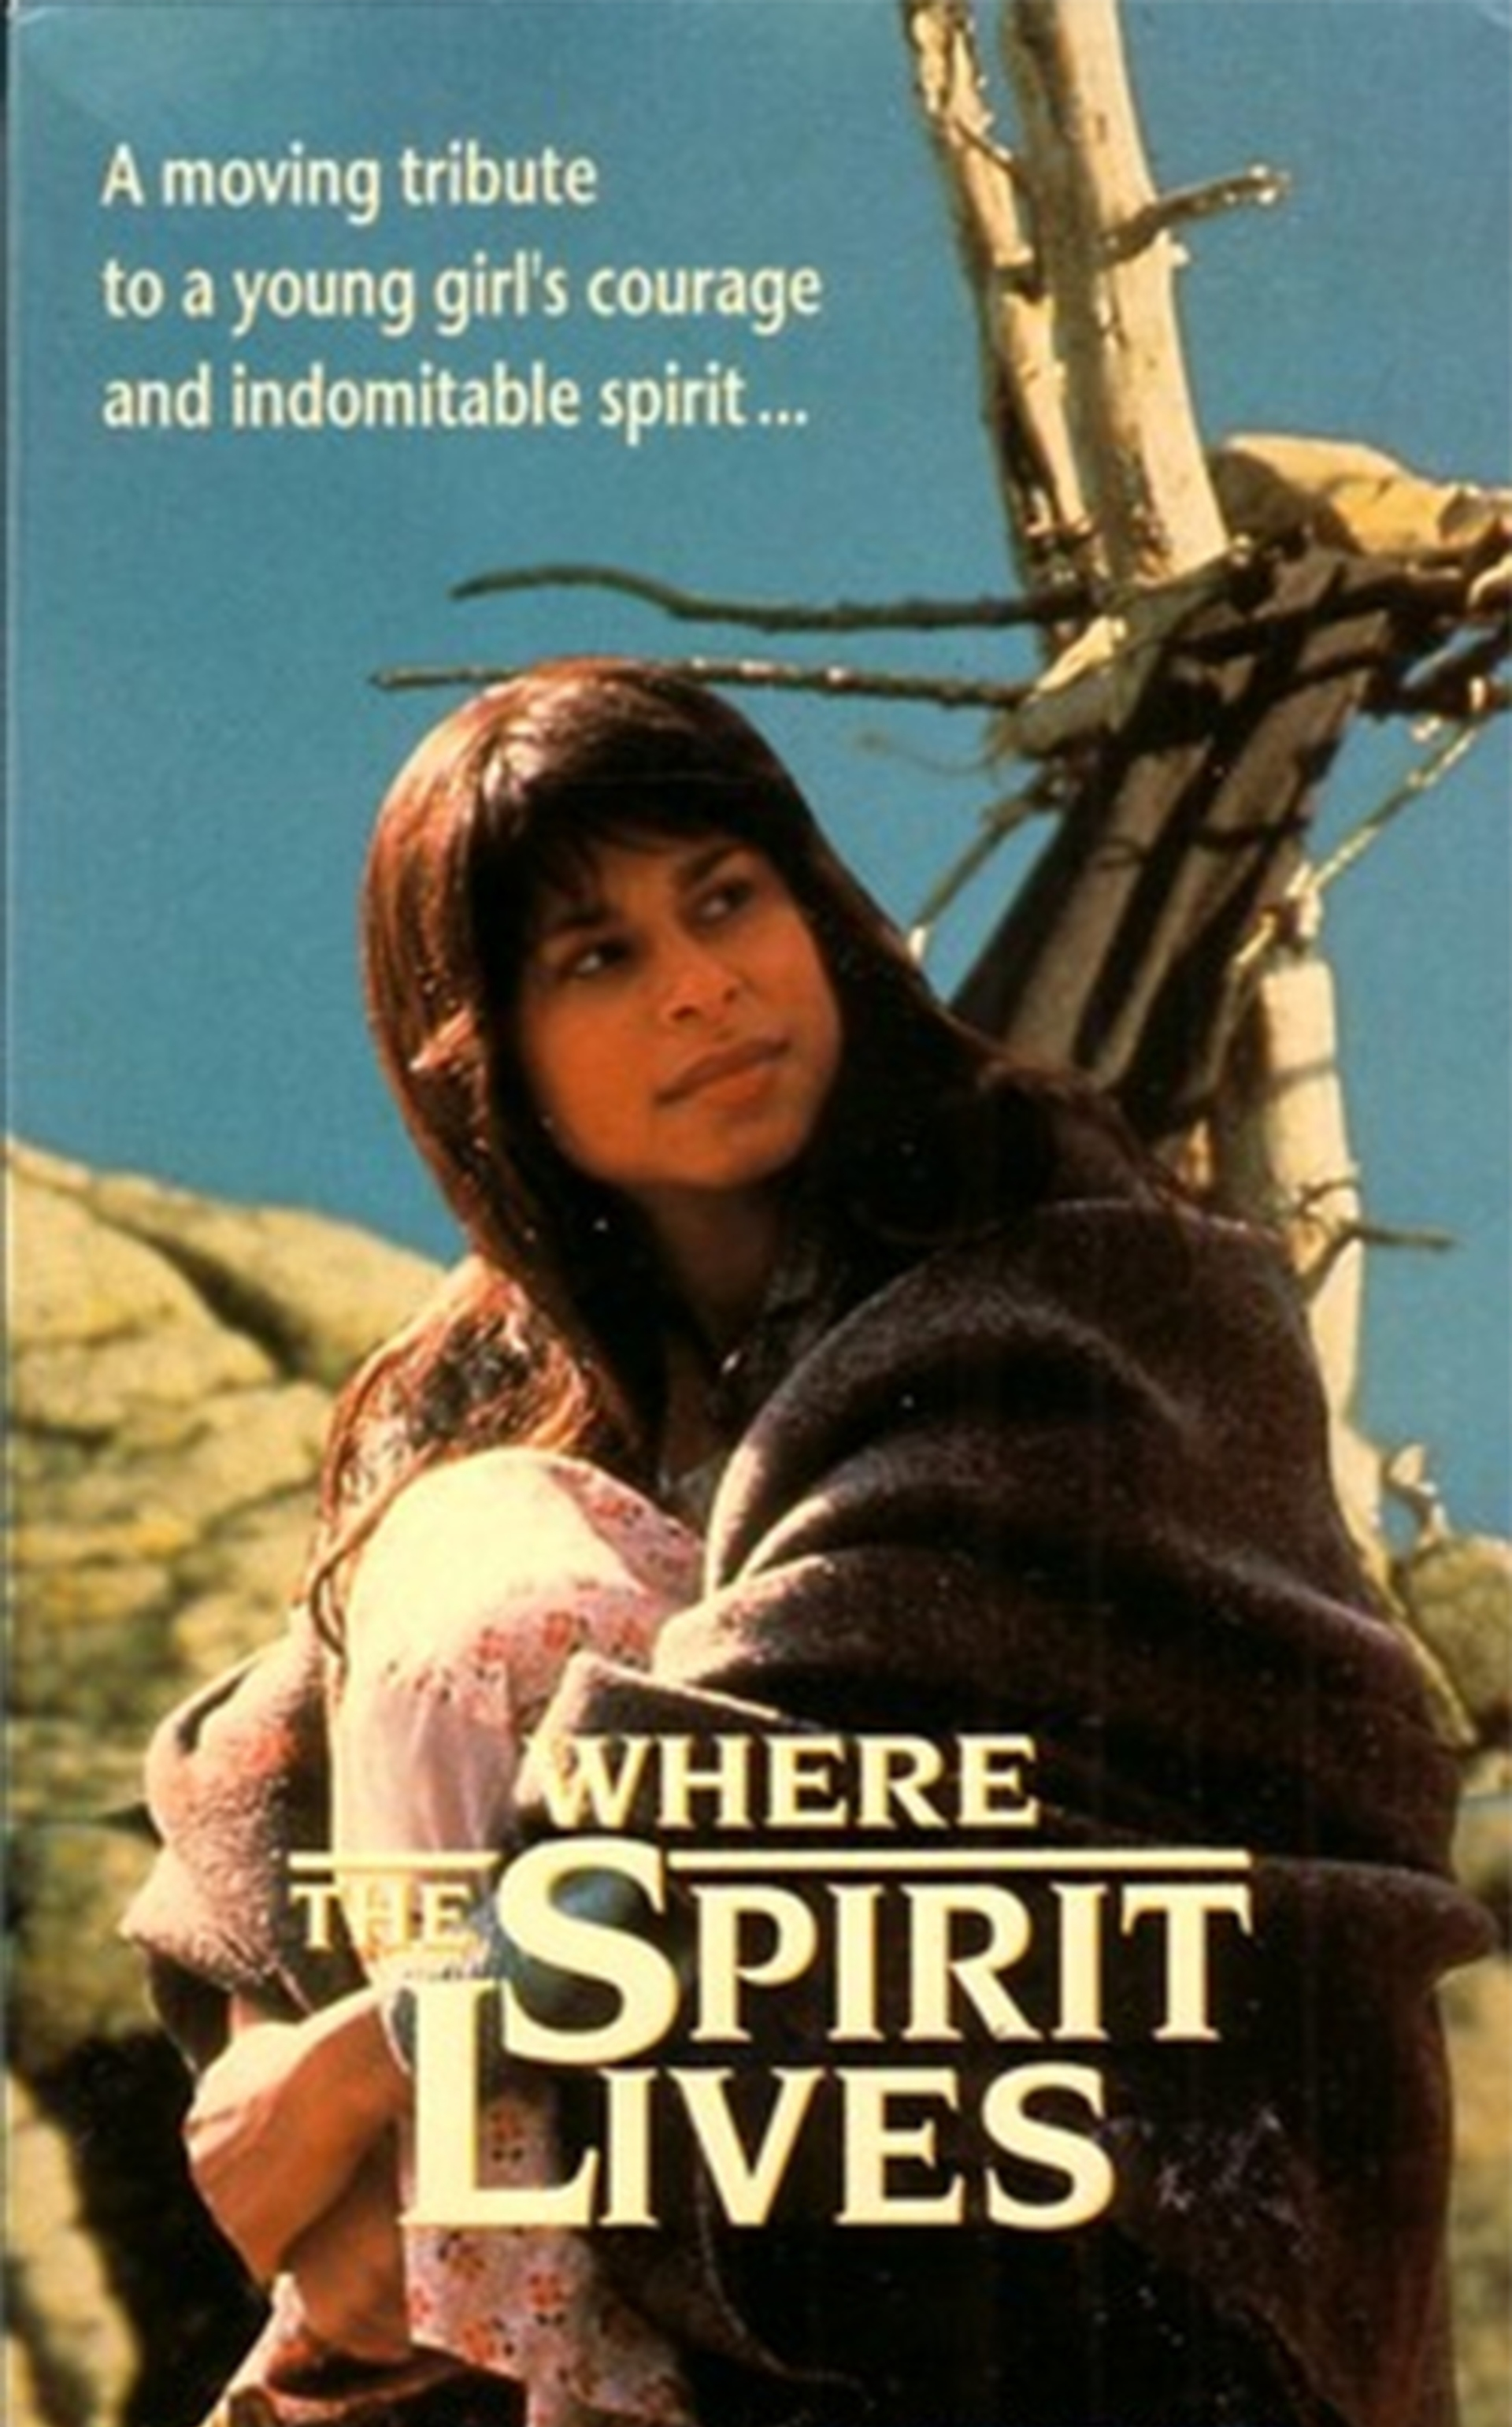 5 beautiful and spiritual films